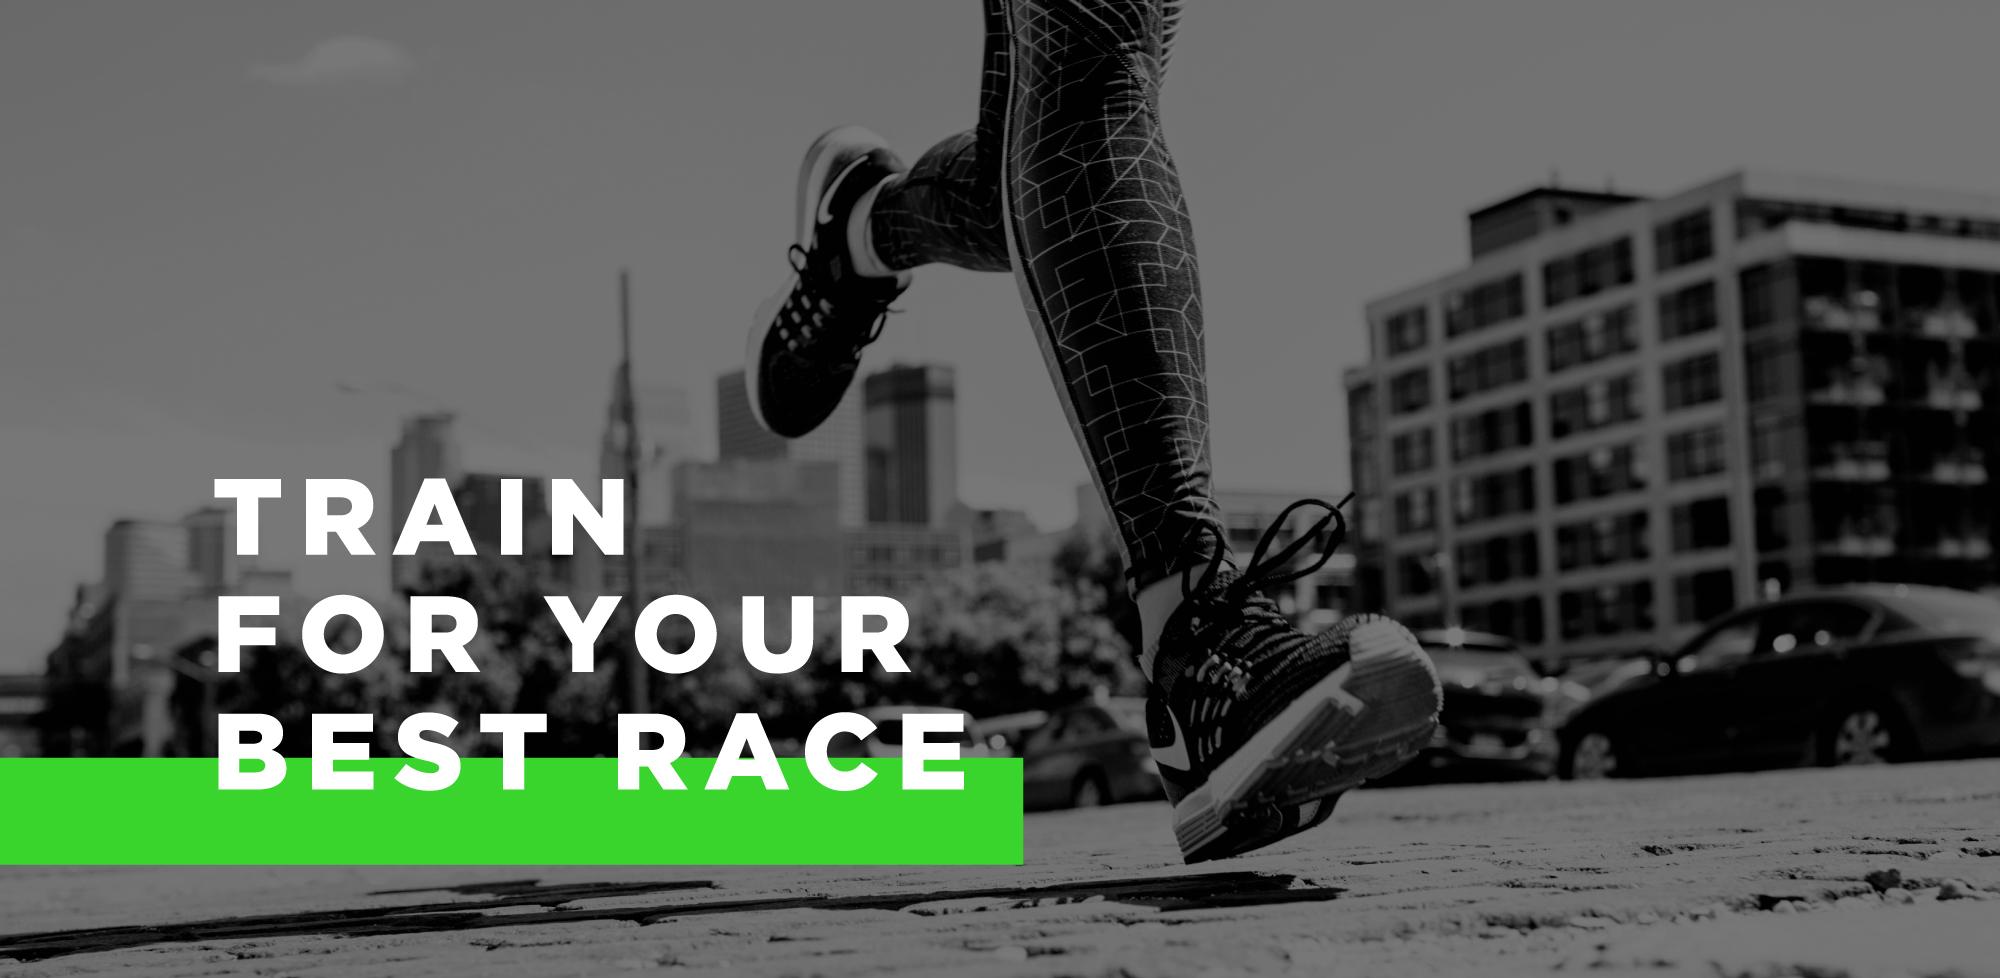 Fly Feet Running - Marketing by Kayd Roy